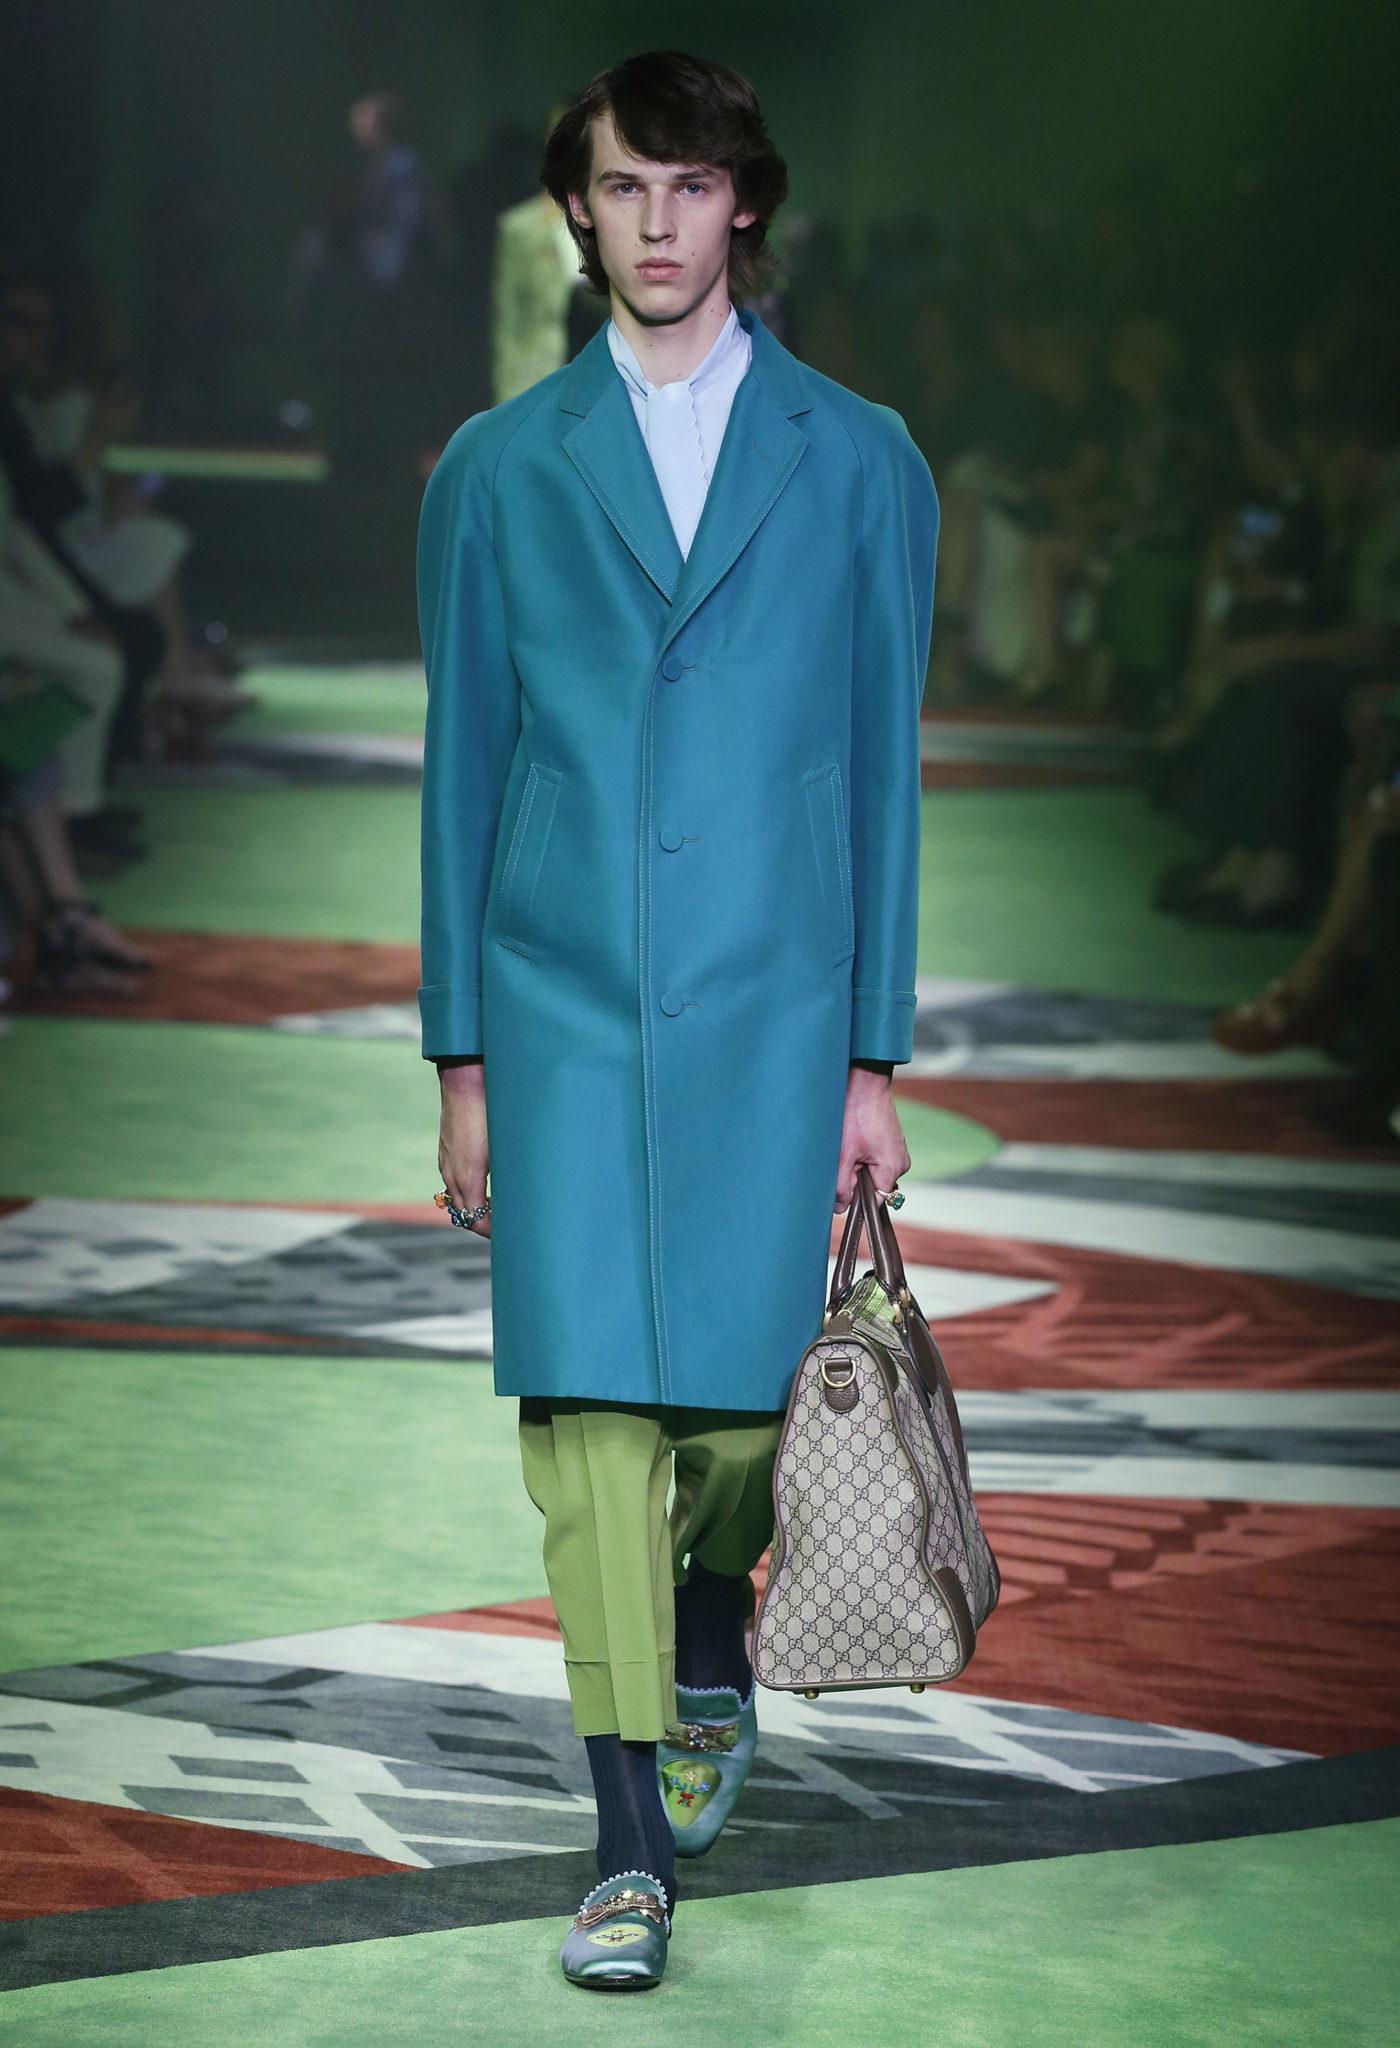 blog-mode-homme-strasbourg-PANTONE-greenery-2017-Menswear-Gucci-5